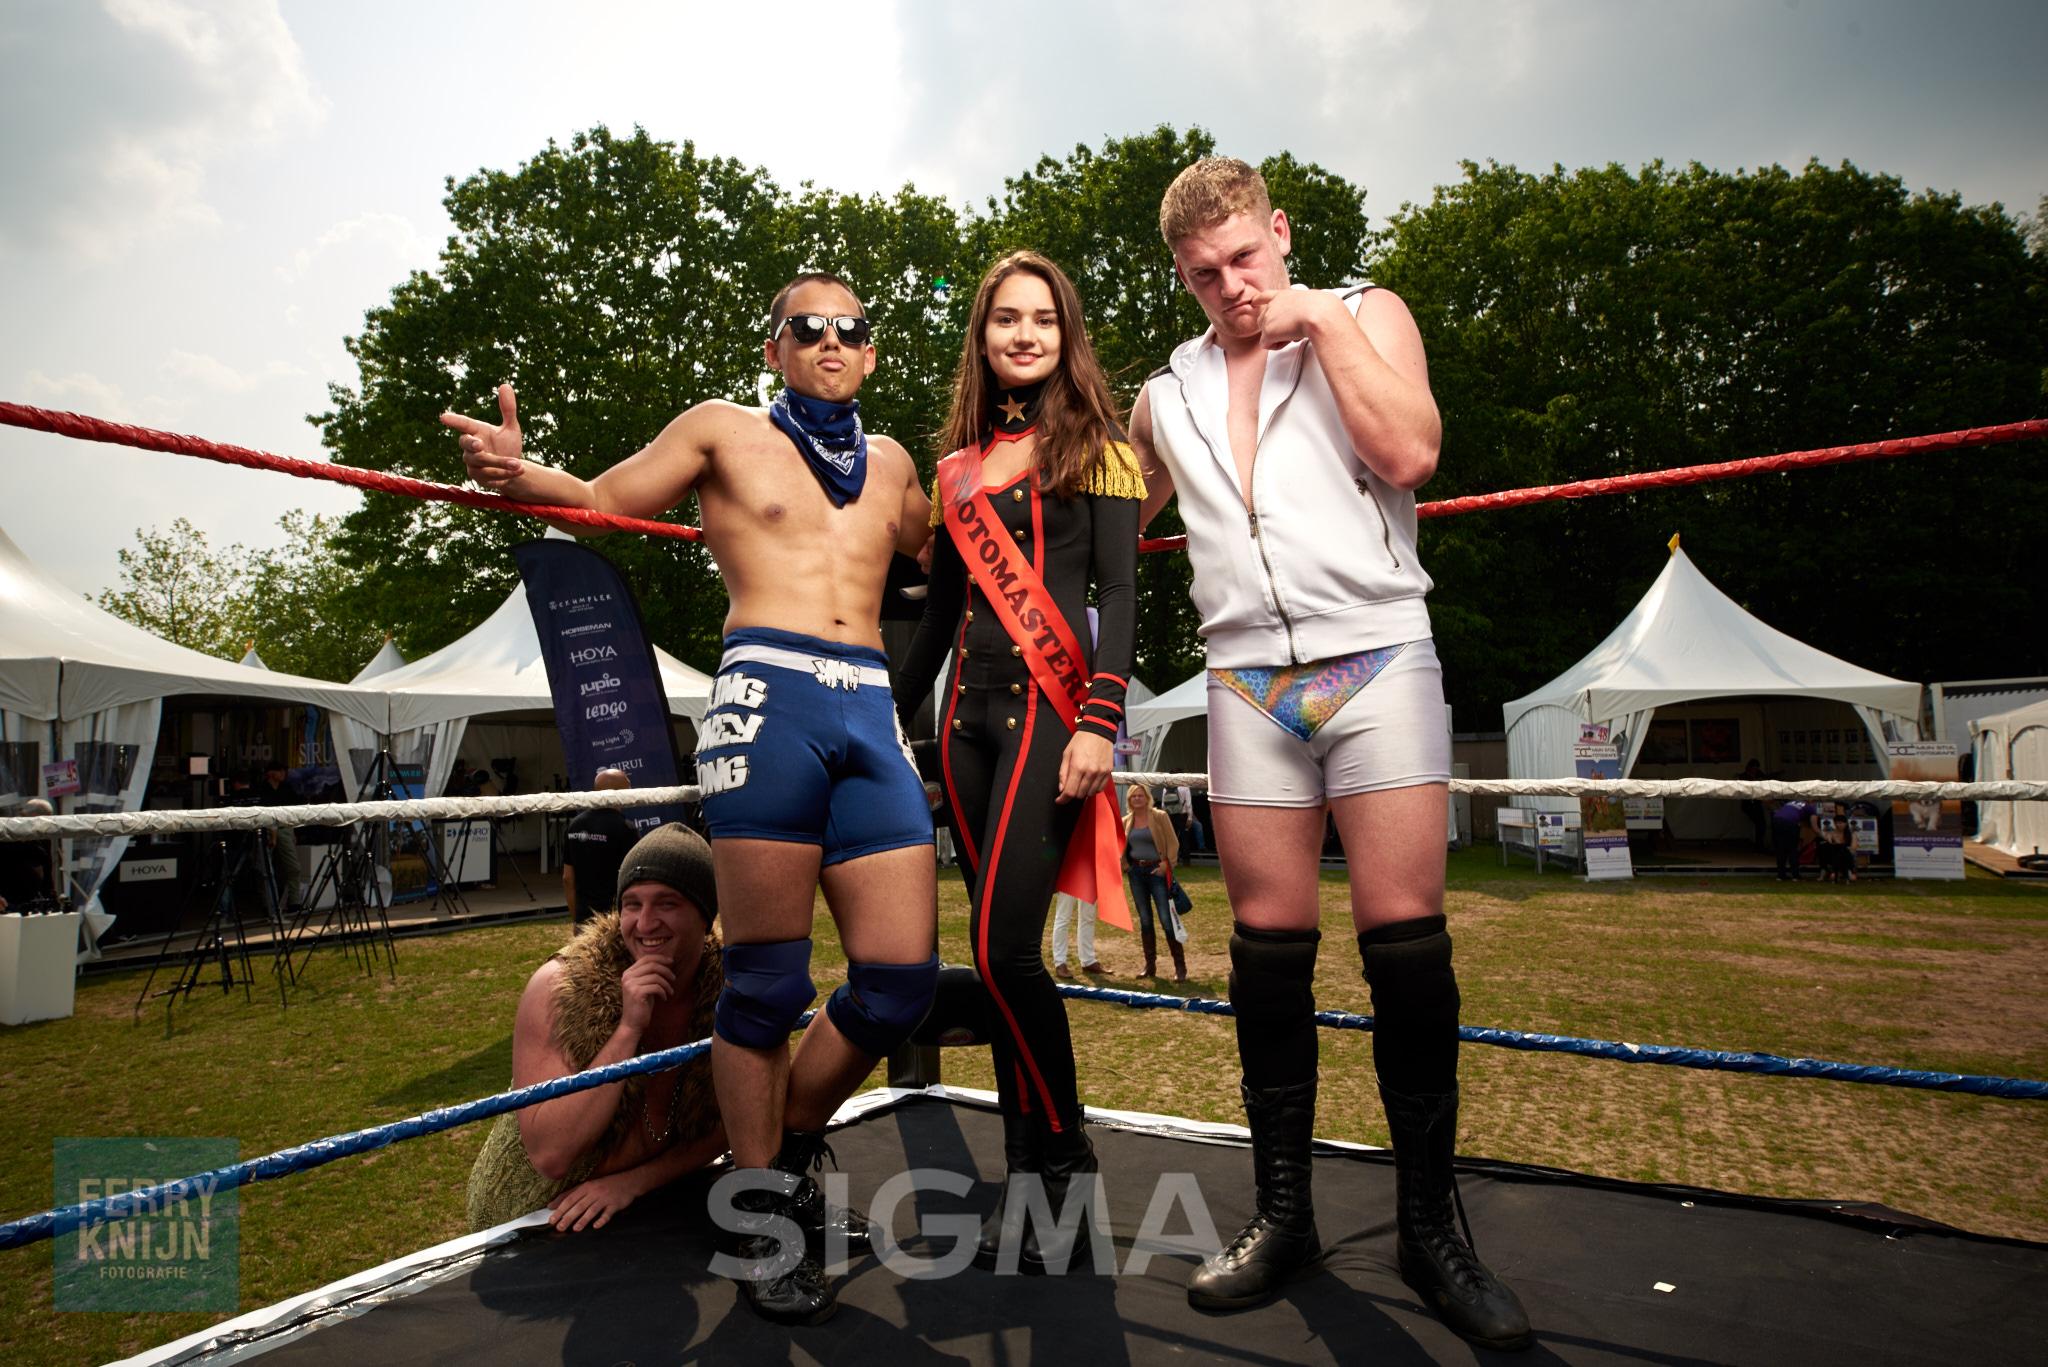 16_05_28_NIKON D750_Sigma FotoFair Wrestling__DSC0859_HighWeb.jpg